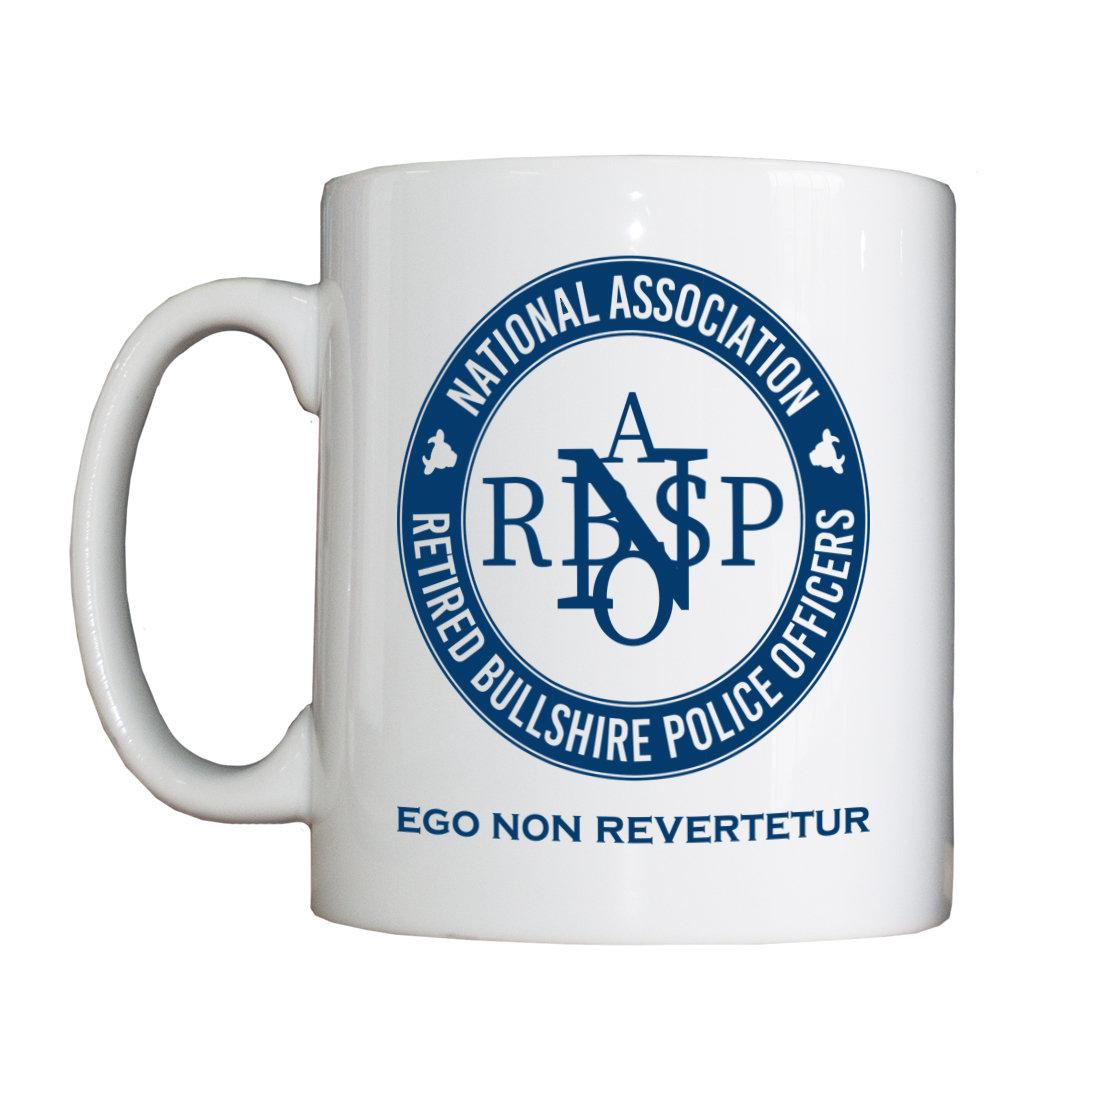 Personalised 'NARBSPO' Drinking Vessel NARBSPORetiredVessel